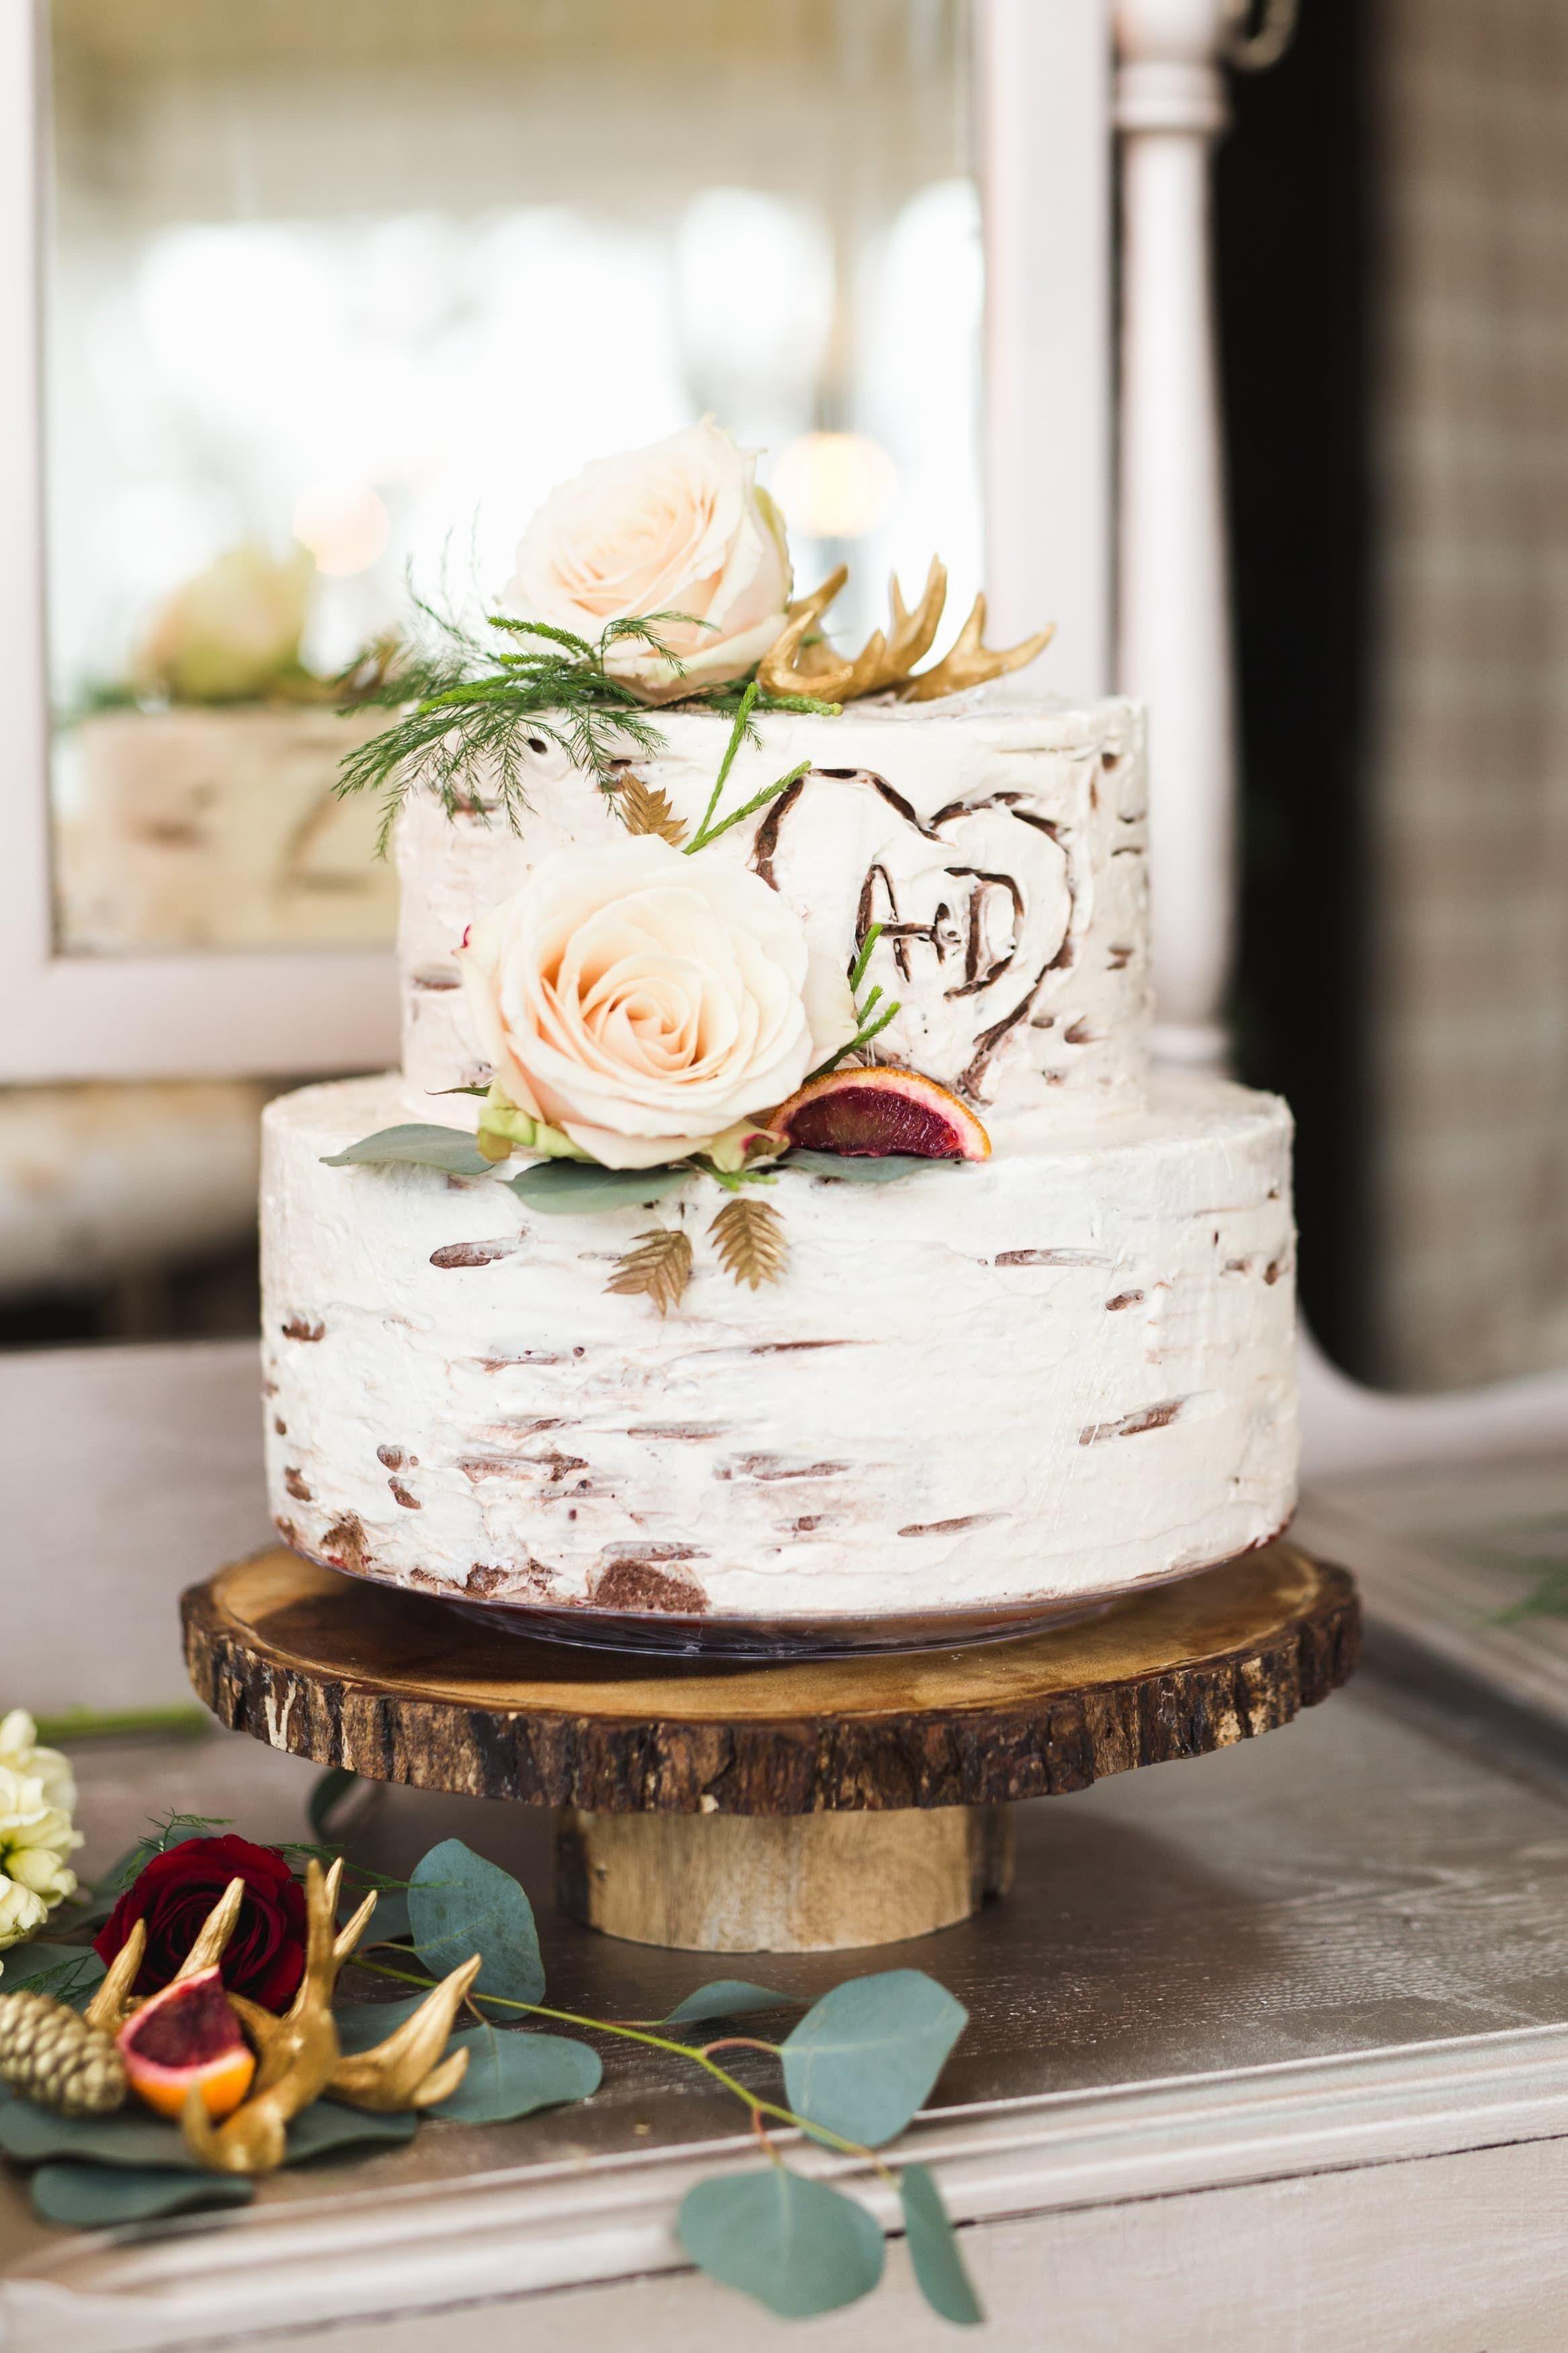 rustic wedding cakes wedding ideas pinterest wooden cake